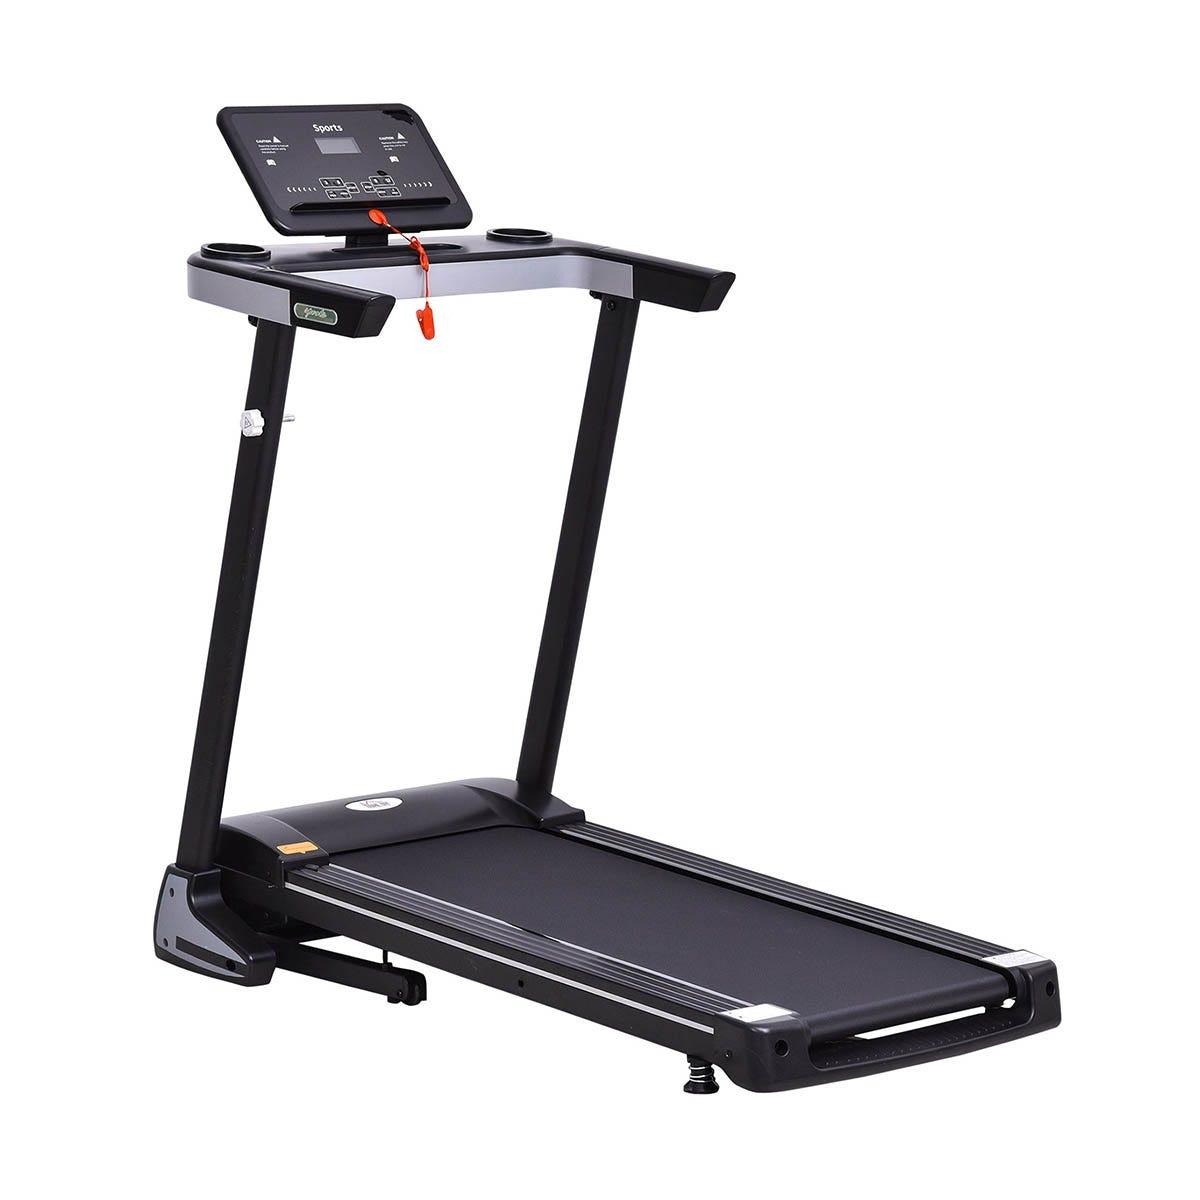 HOMCOM Treadmill Electric 1-12Km/h Motorized Power Folding Running Machine